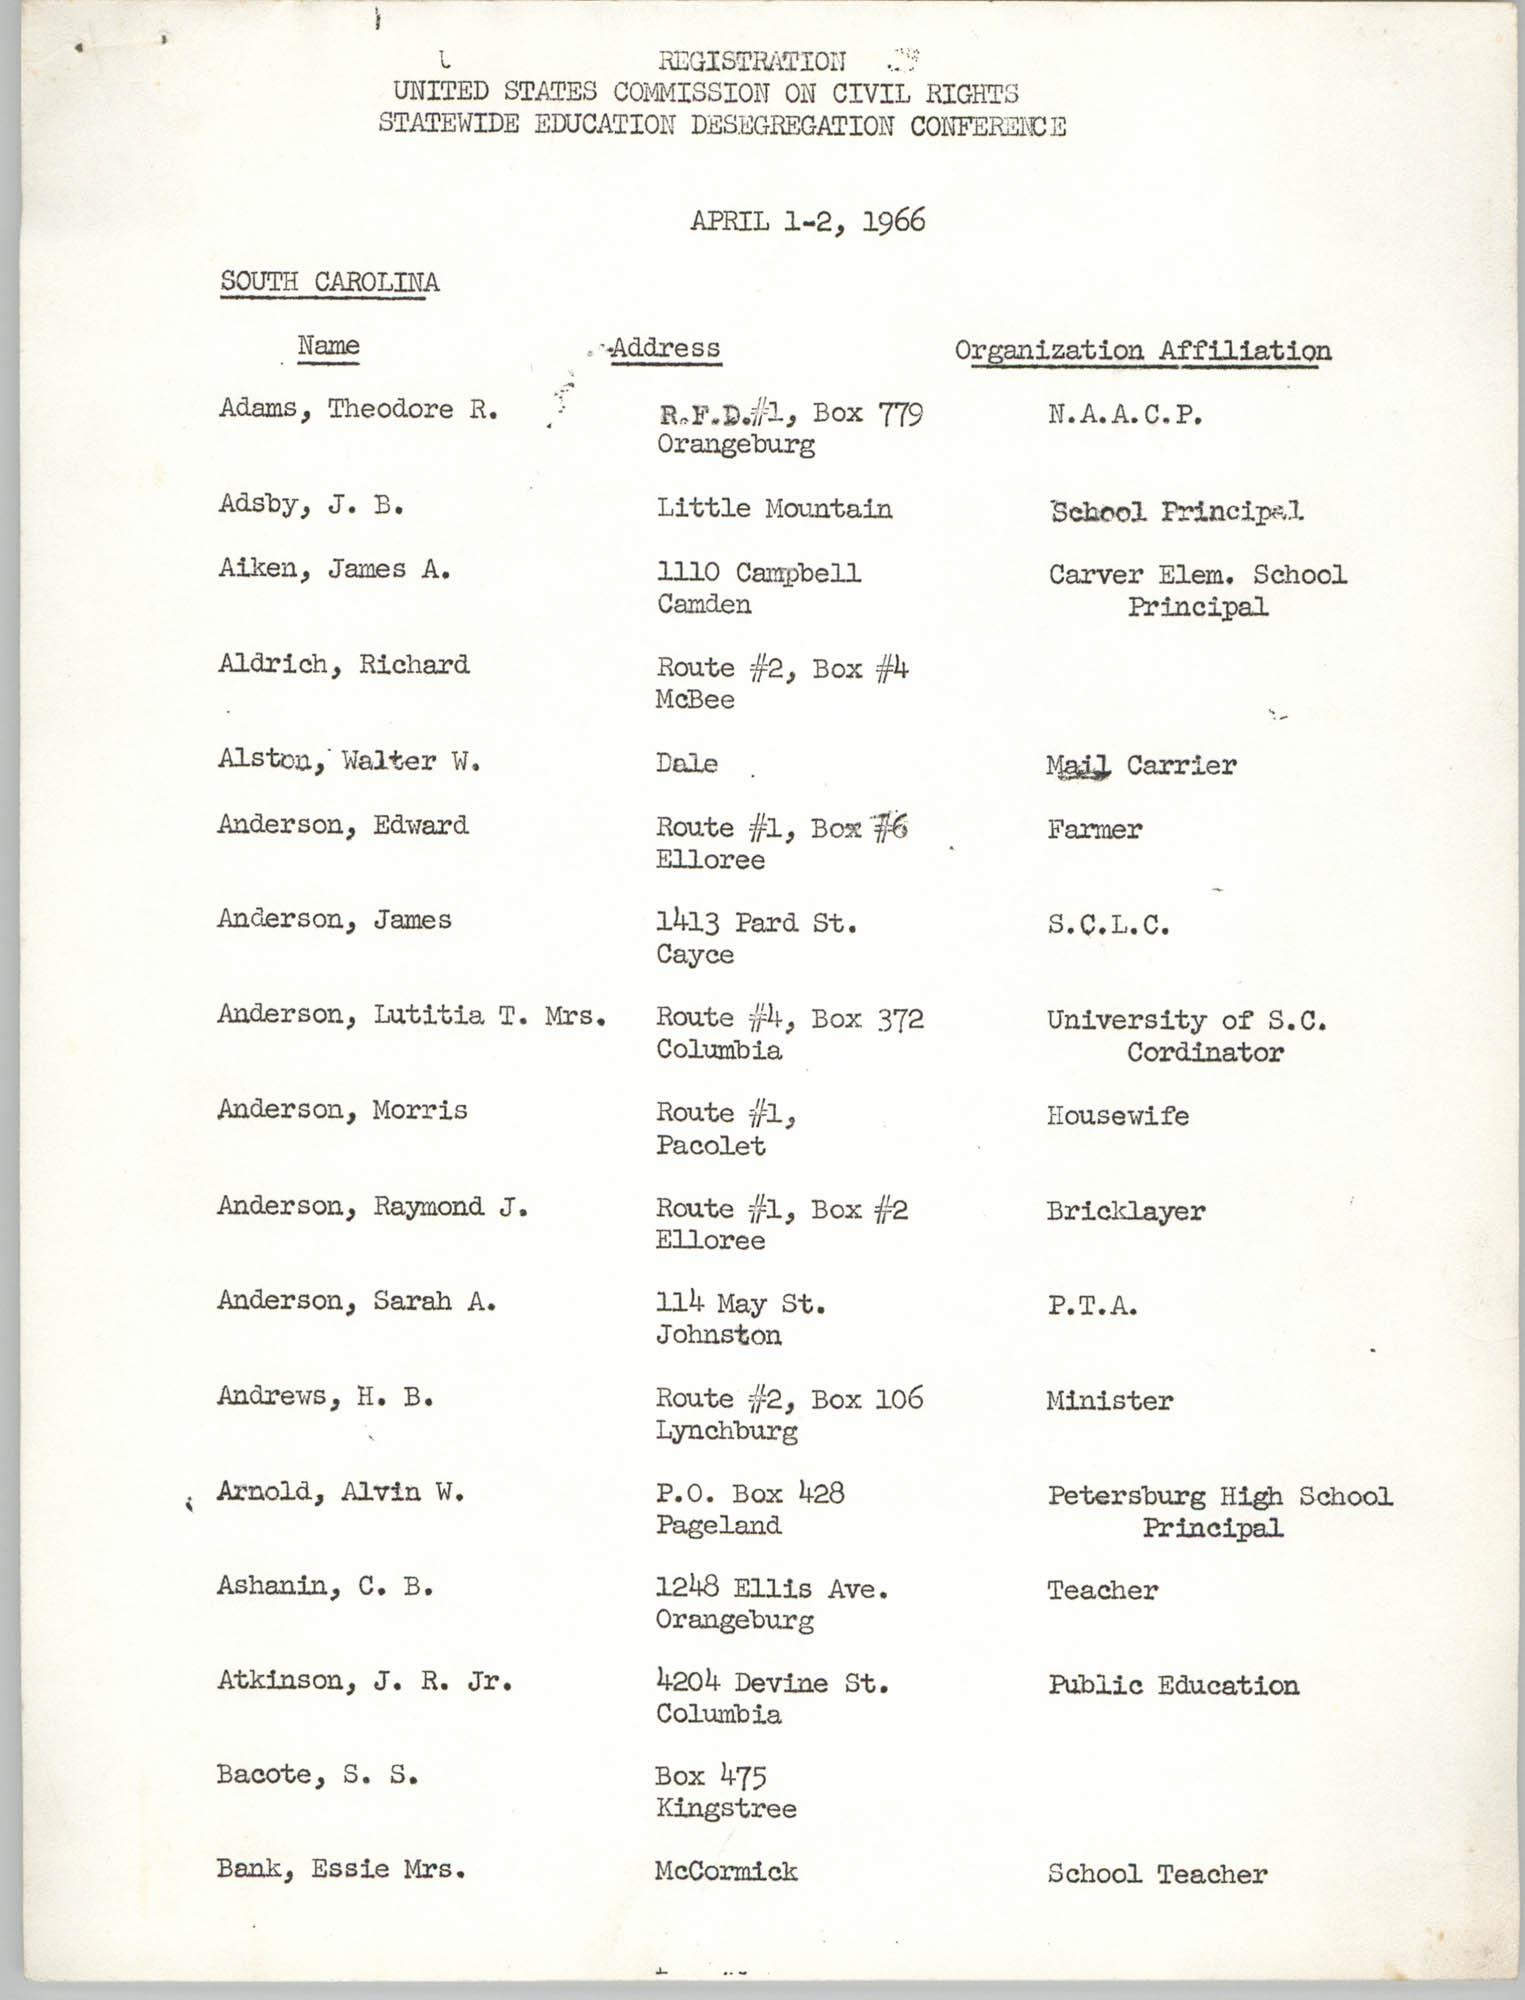 Registration, U.S. Commission on Civil Rights, Statewide Education Desegregation Conference